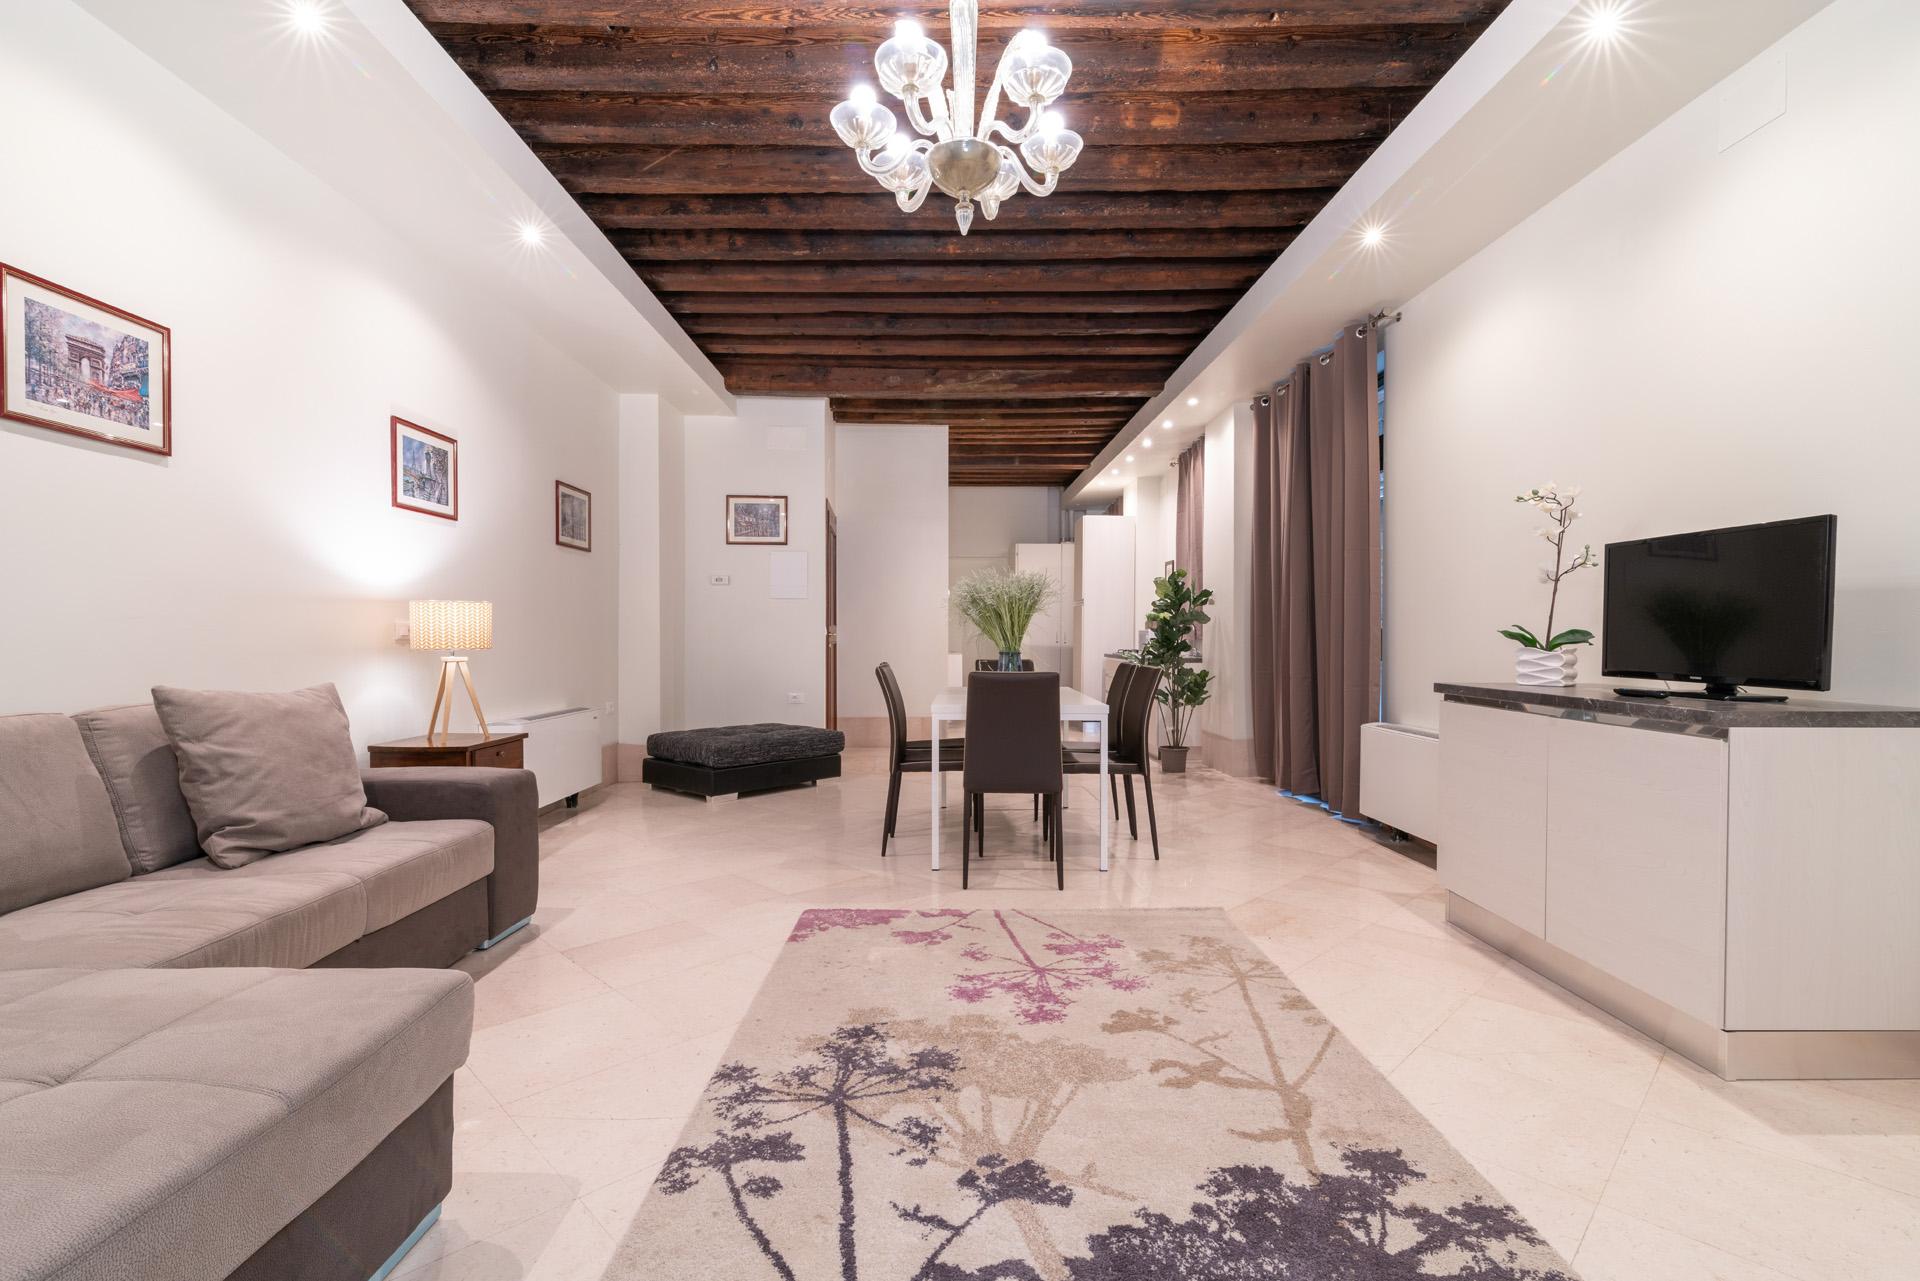 Fotografo di interni per hotel bnb appartamenti agenzie for Interni di appartamenti